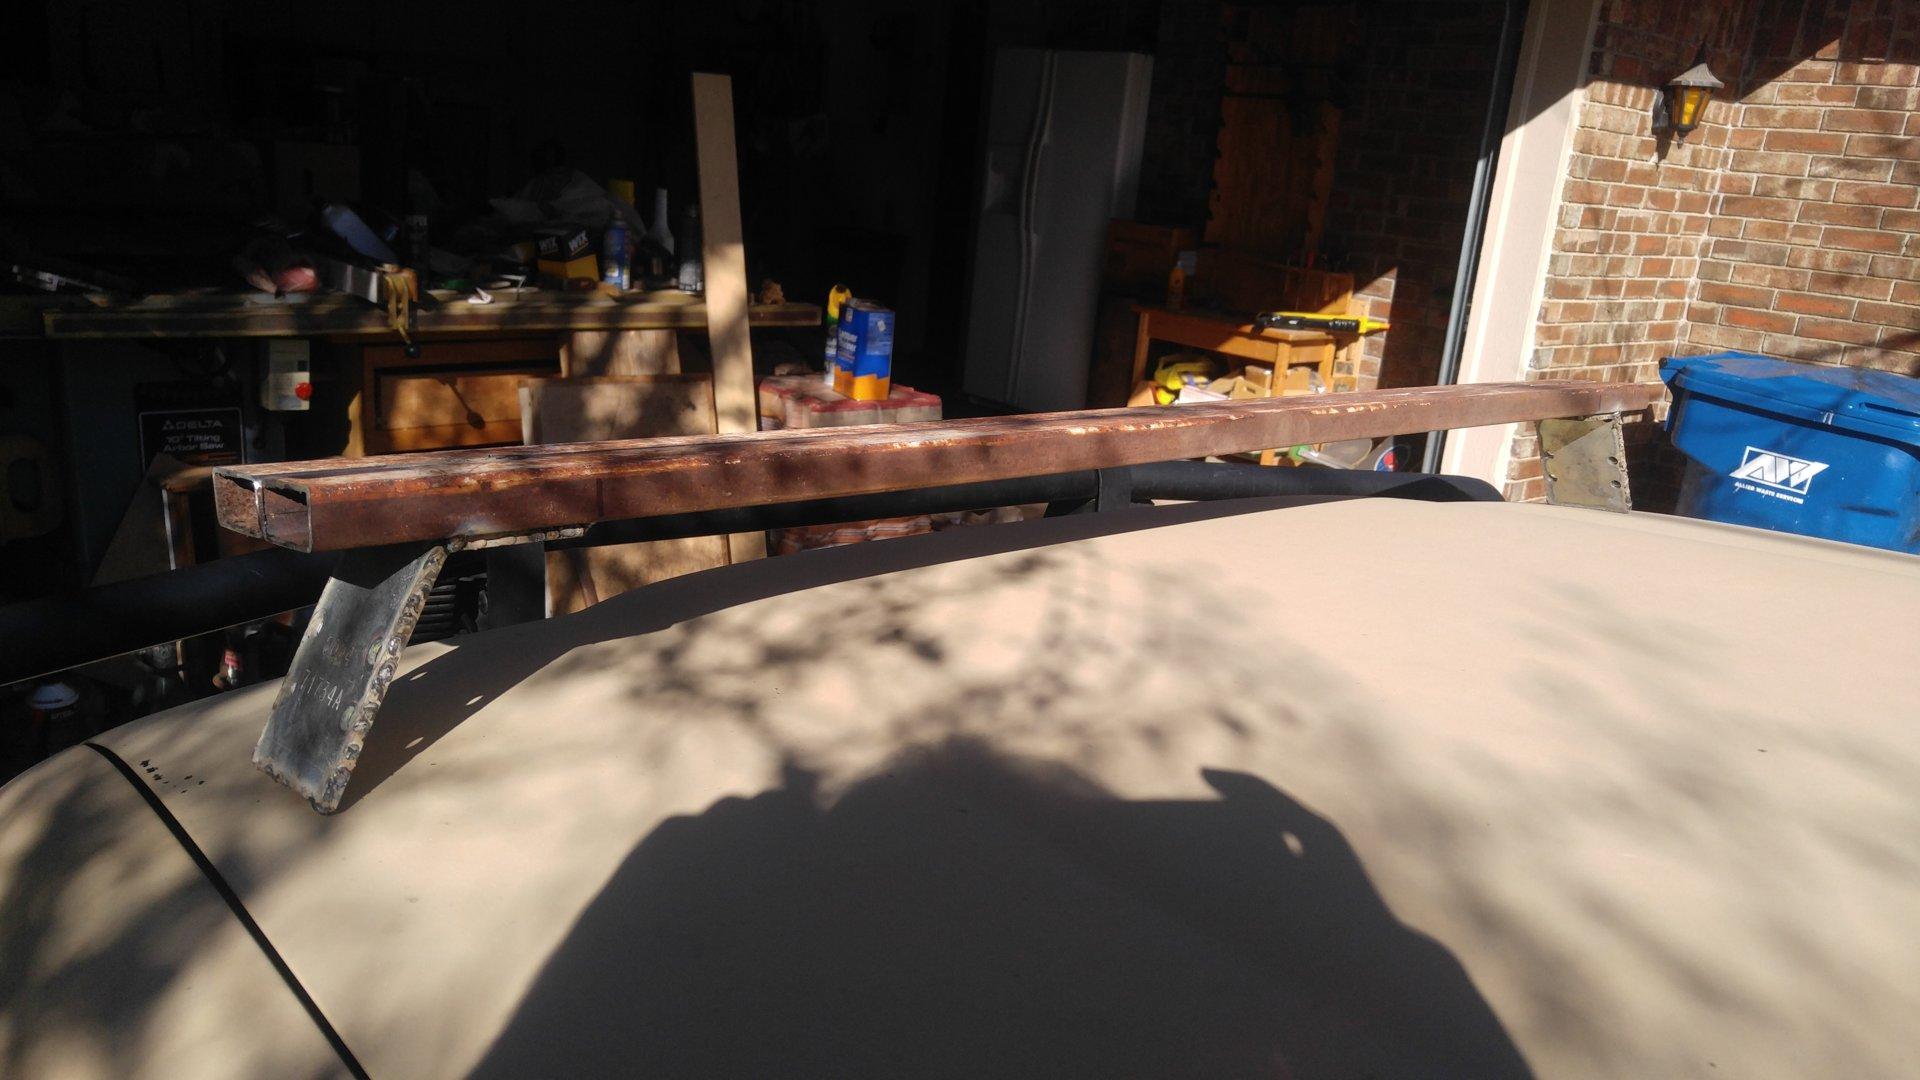 New Low Profile Gutter Mount roof rack | IH8MUD Forum